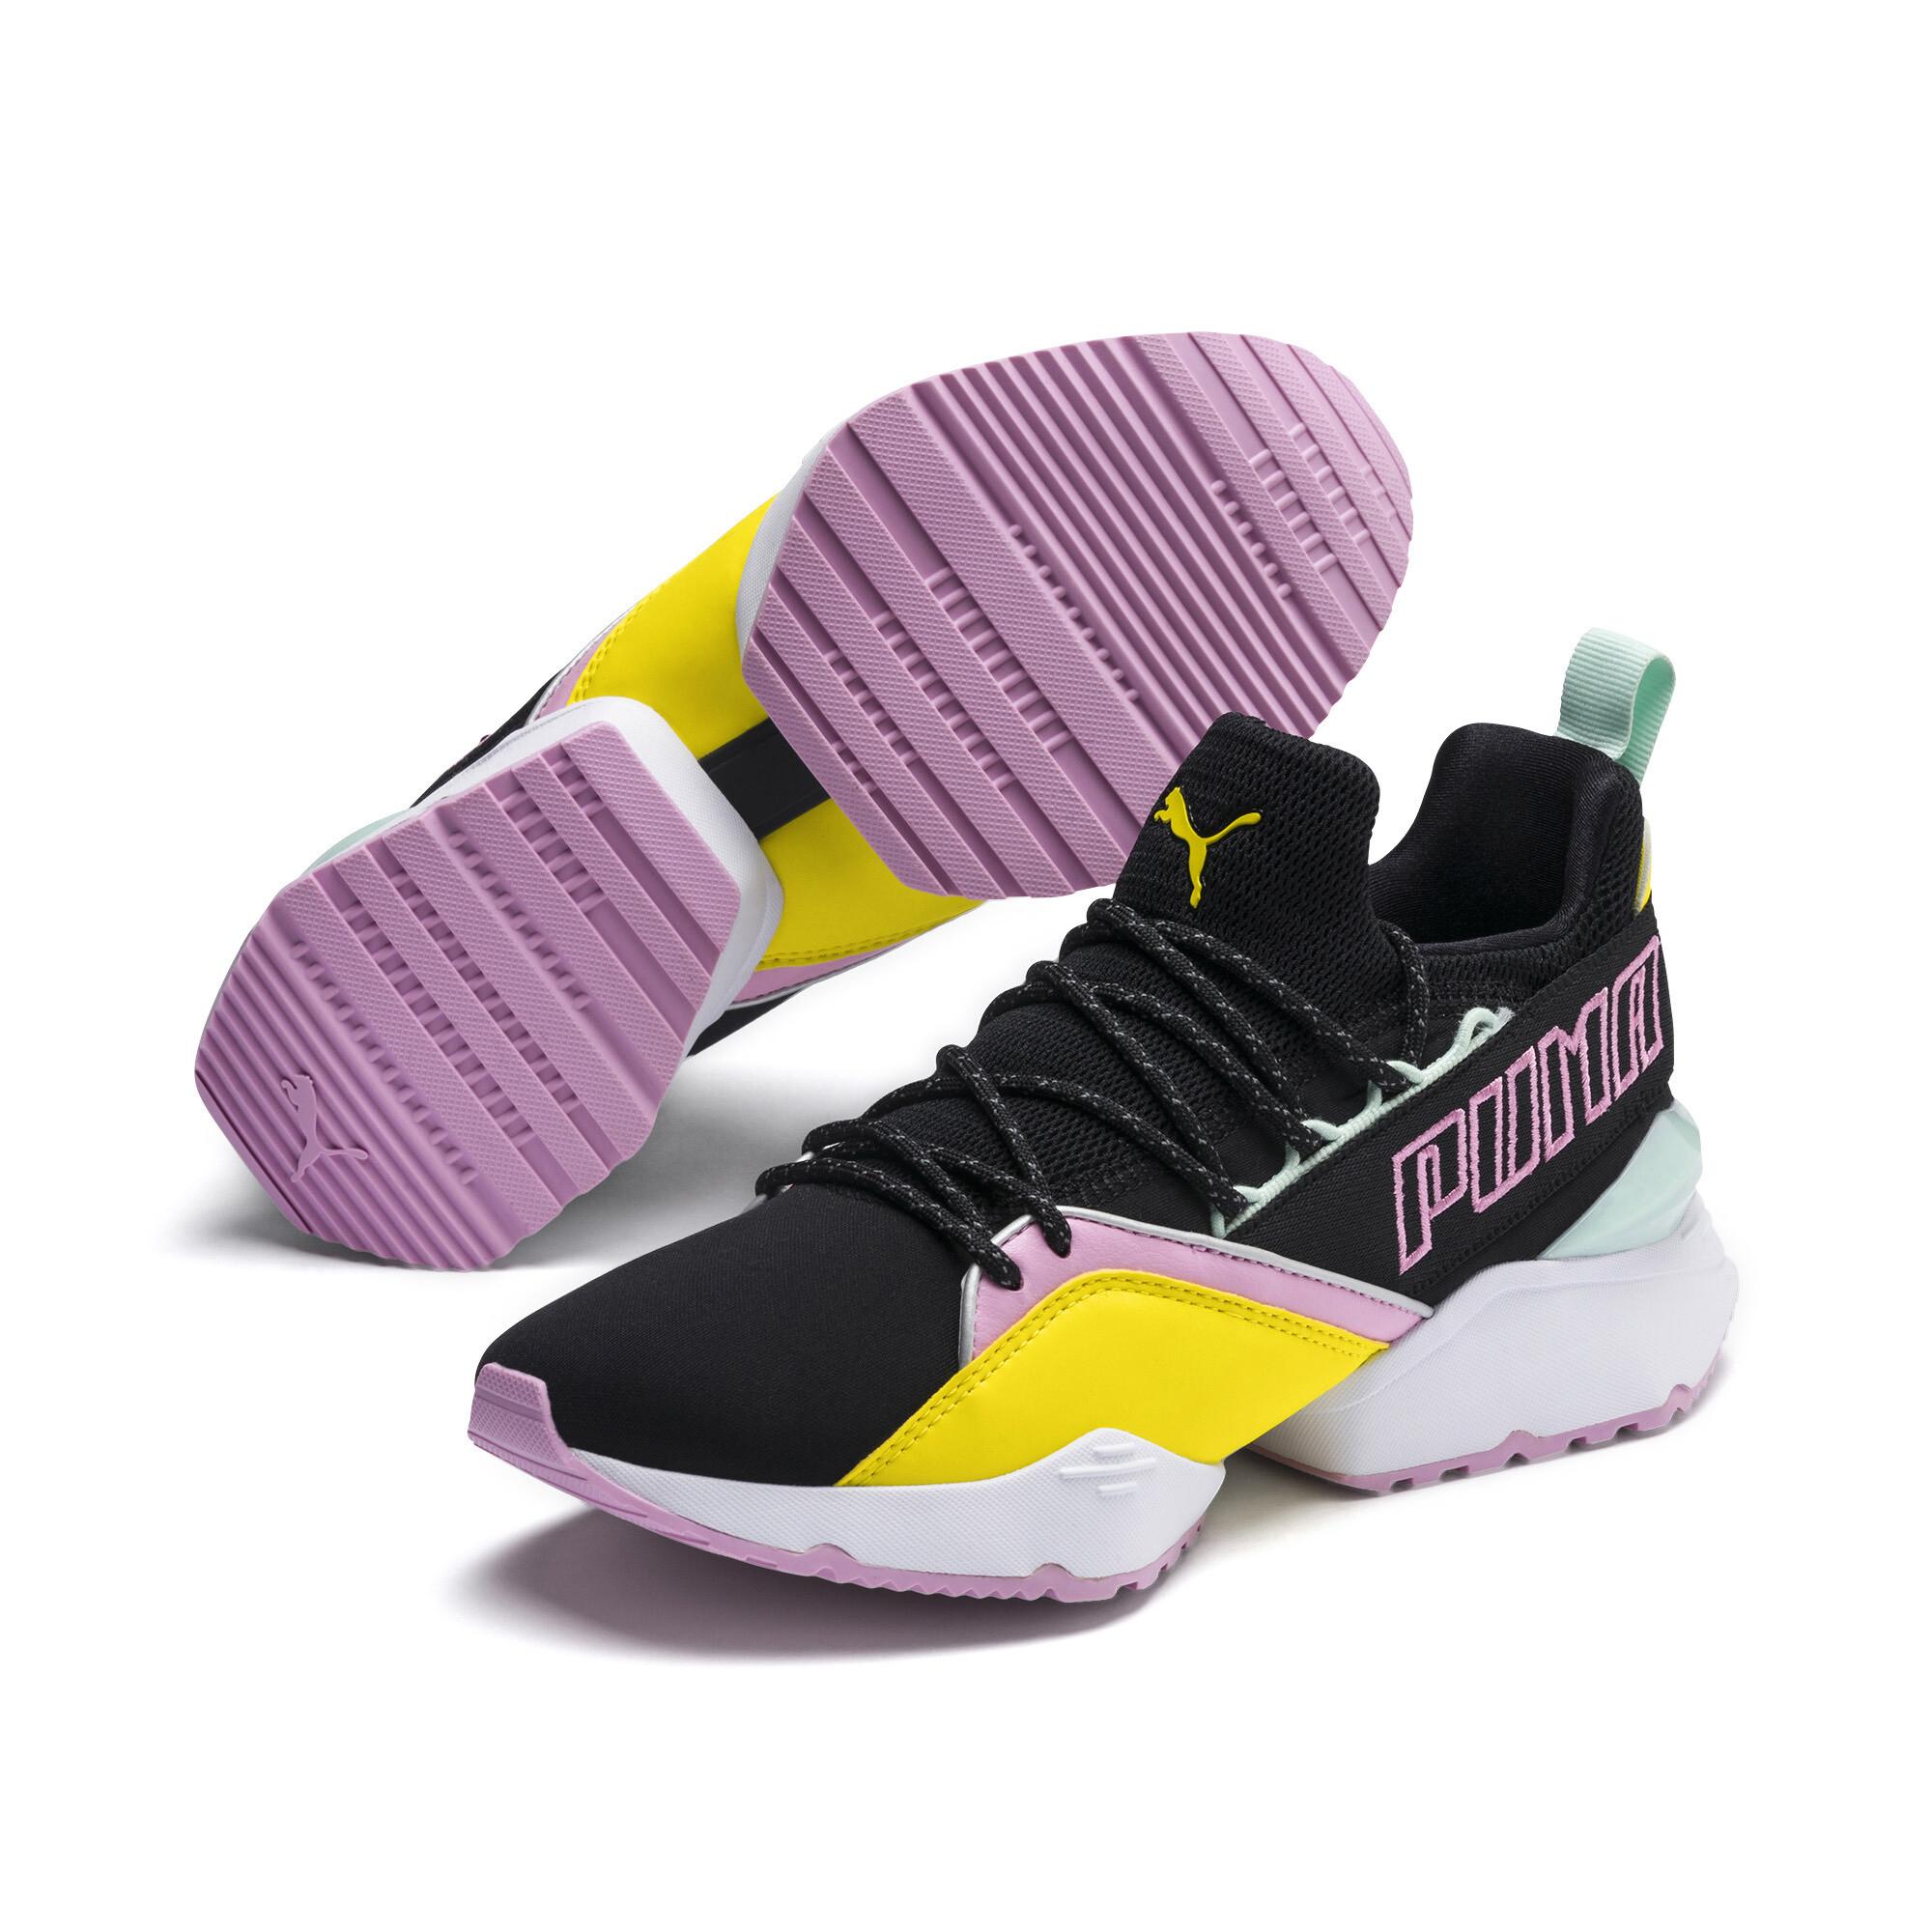 Image Puma Muse Maia TZ Women's Sneakers #3